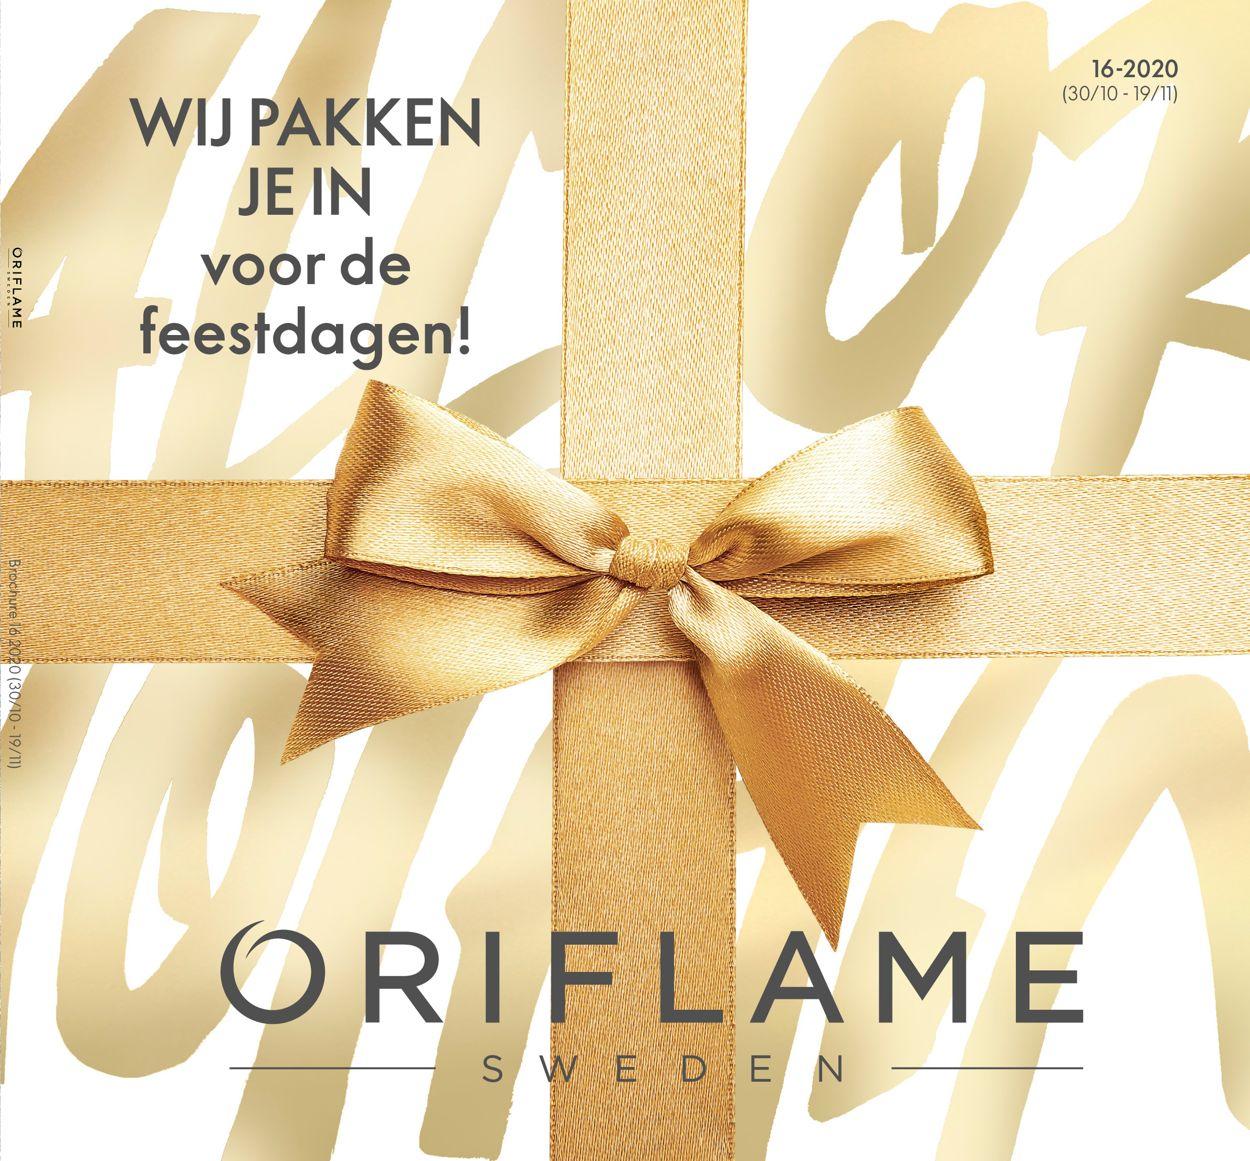 Oriflame Black Friday 2020 Folder - 30.10-19.11.2020